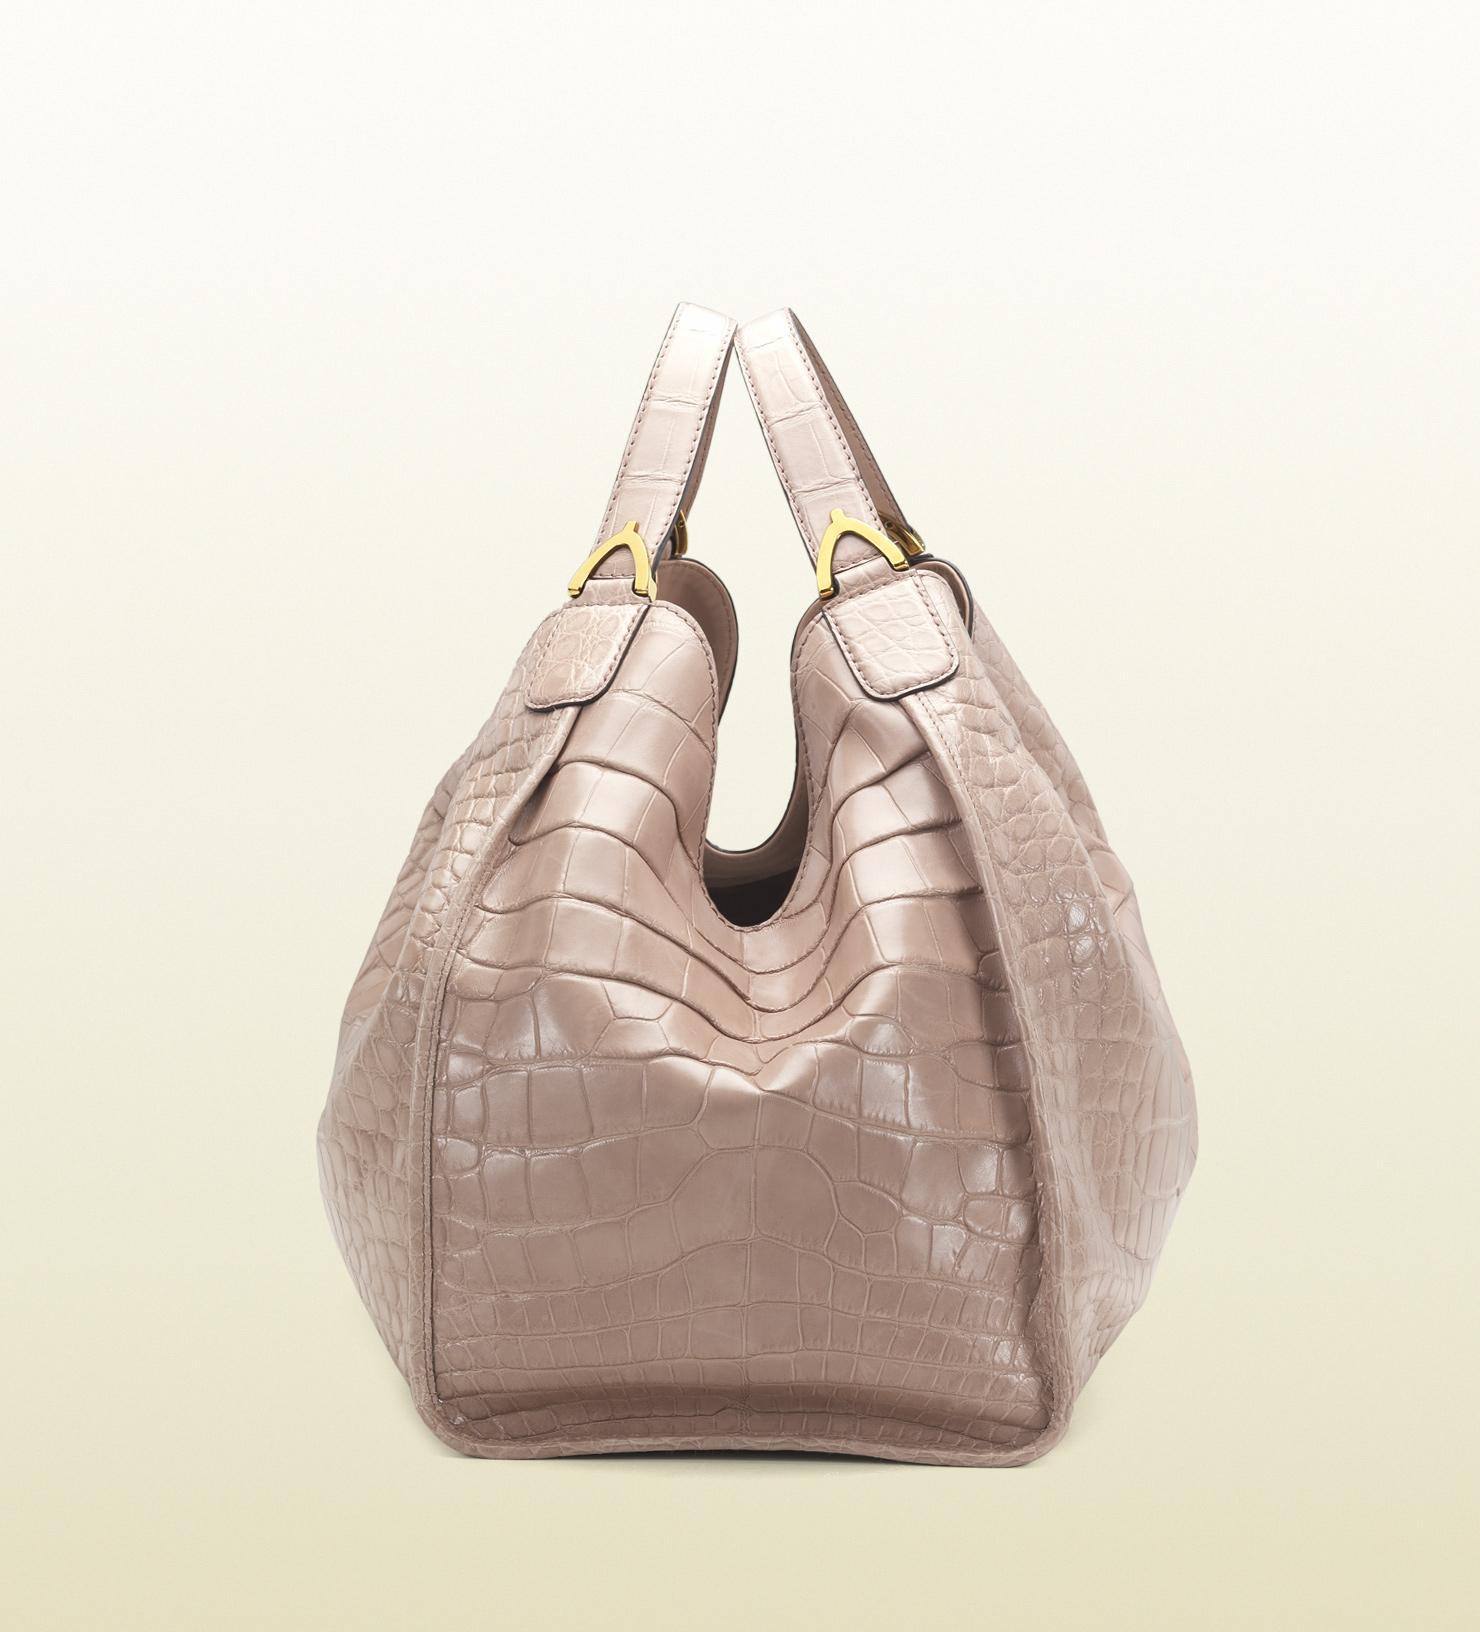 f7bd423b0a54f Lyst - Gucci Soft Stirrup Light Pink Crocodile Shoulder Bag in Pink